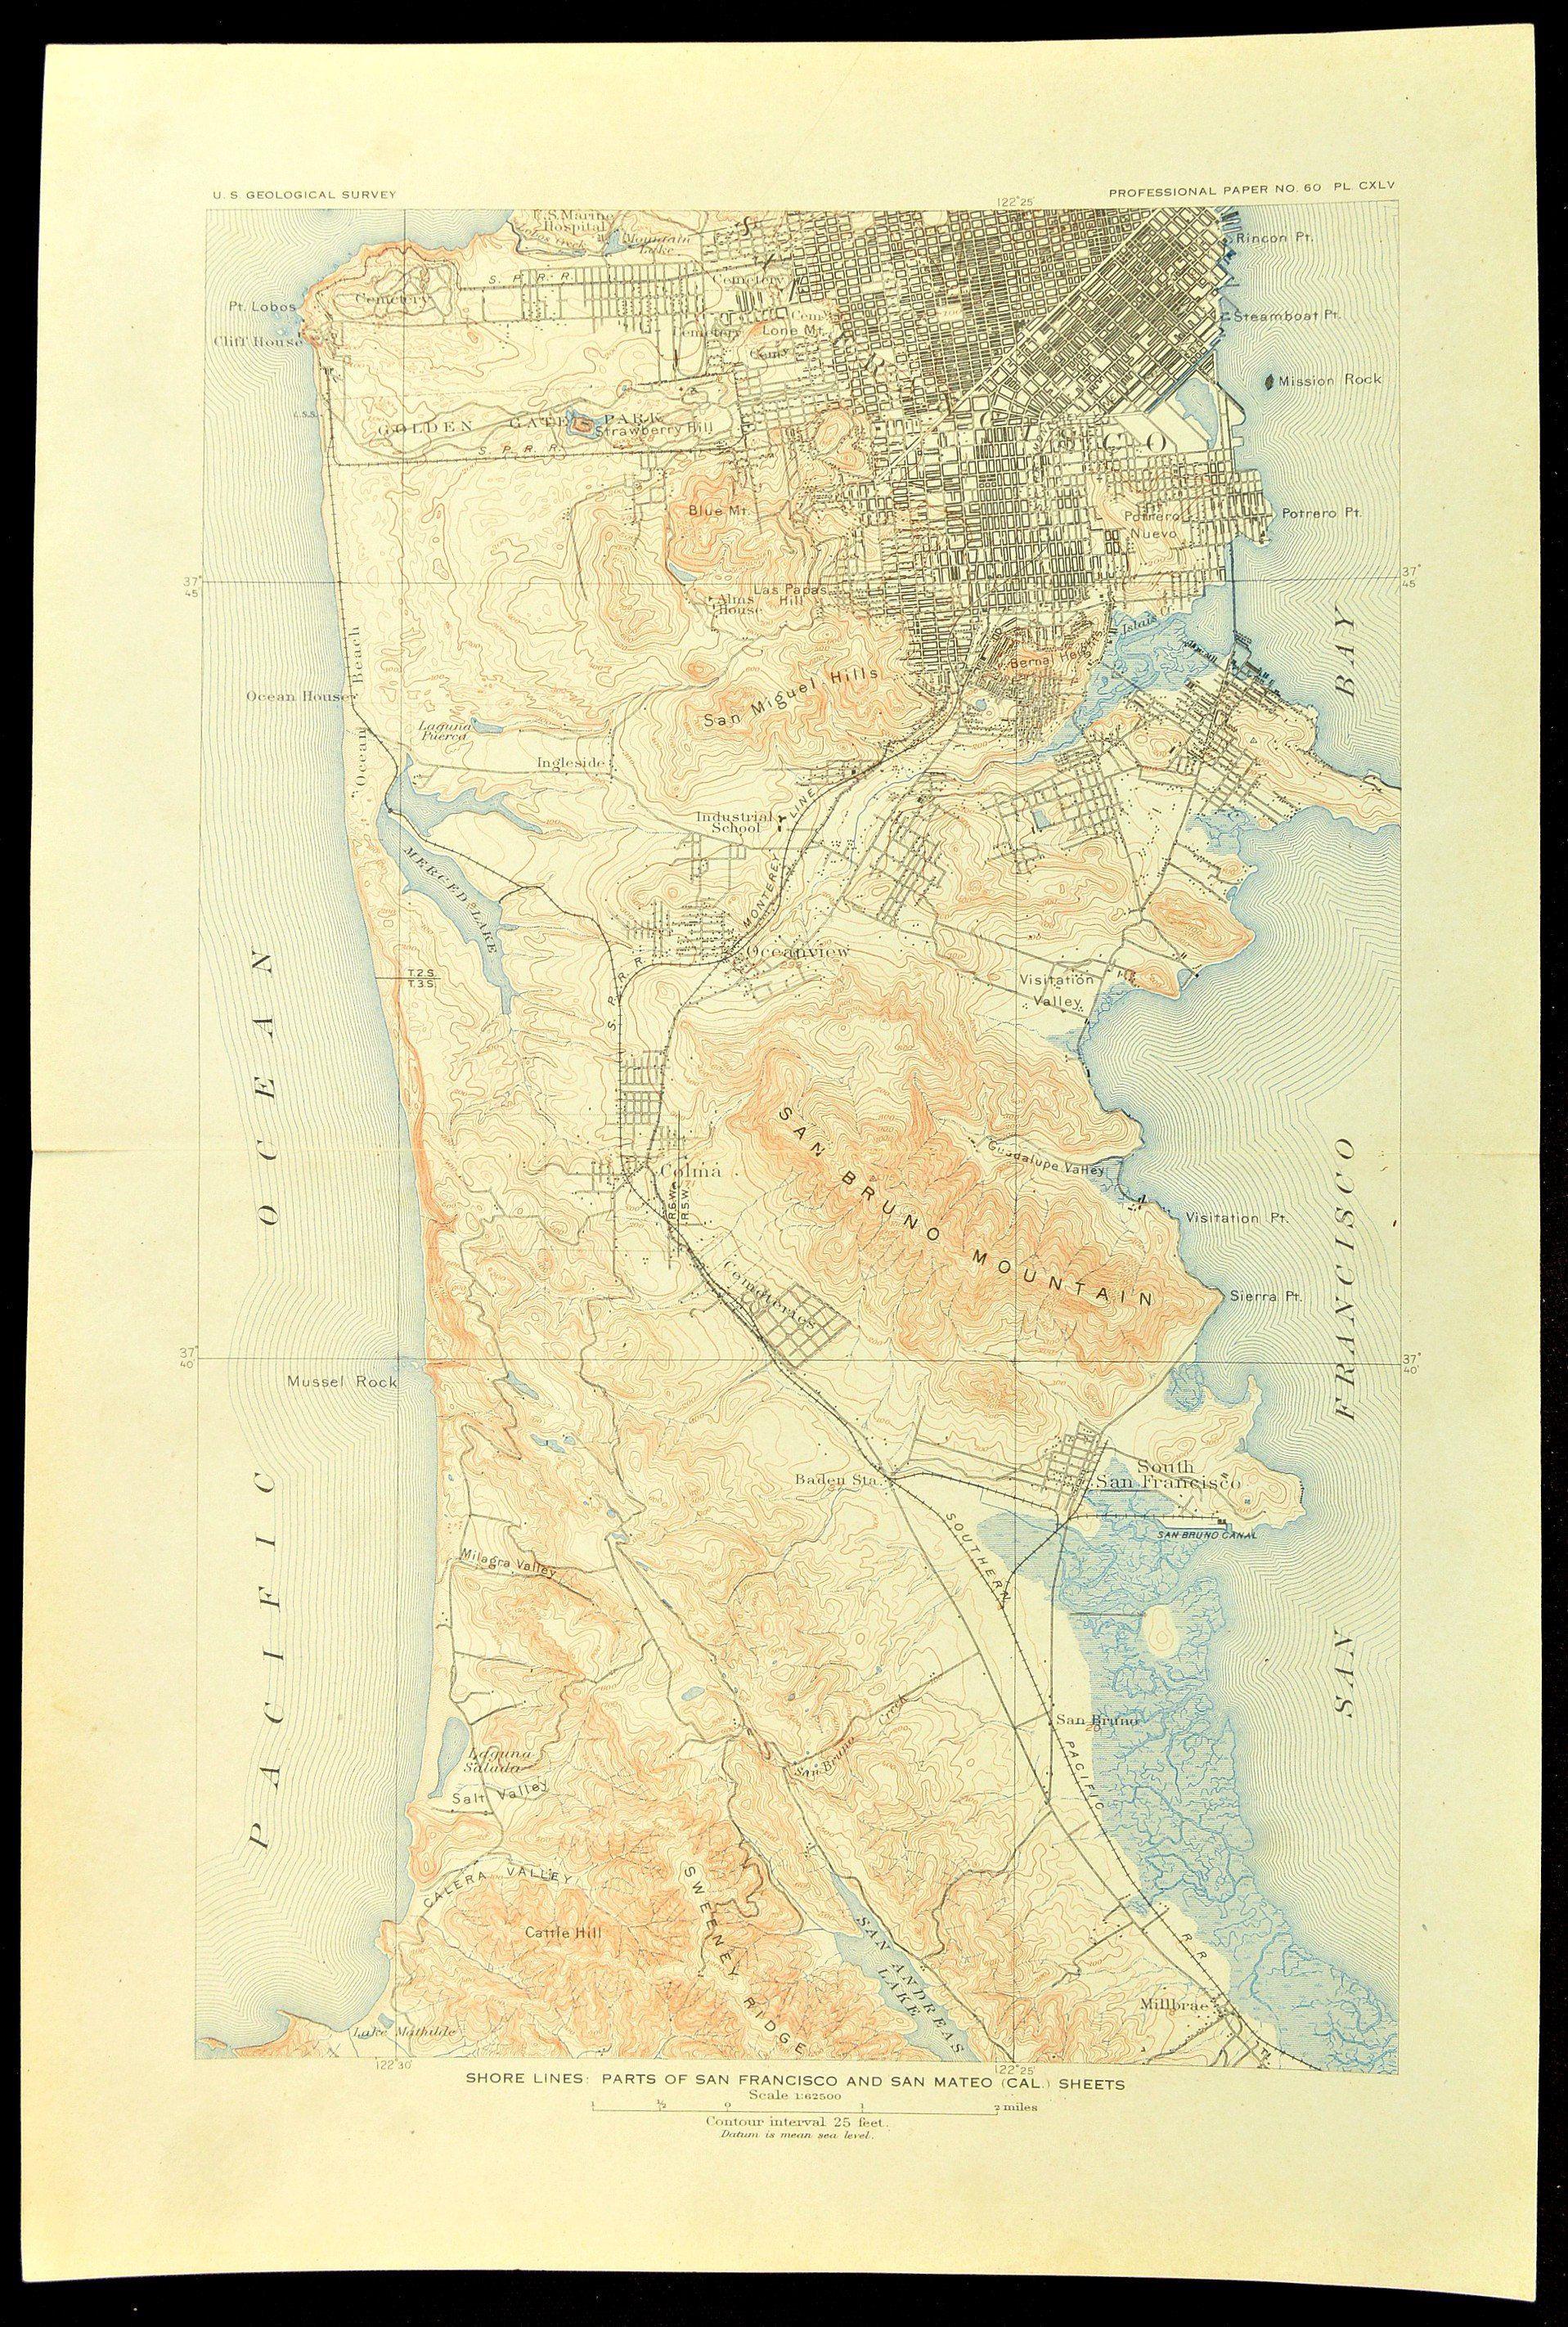 South San Francisco Map of San Bruno Topographic Map Print ... on redwood city map, clovis map, escondido village map, pleasanton map, north san francisco map, port of san francisco map, berkeley map, south san francisco ca map, cathedral city map, san pablo map, lafayette map, porterville map, market st san francisco map,